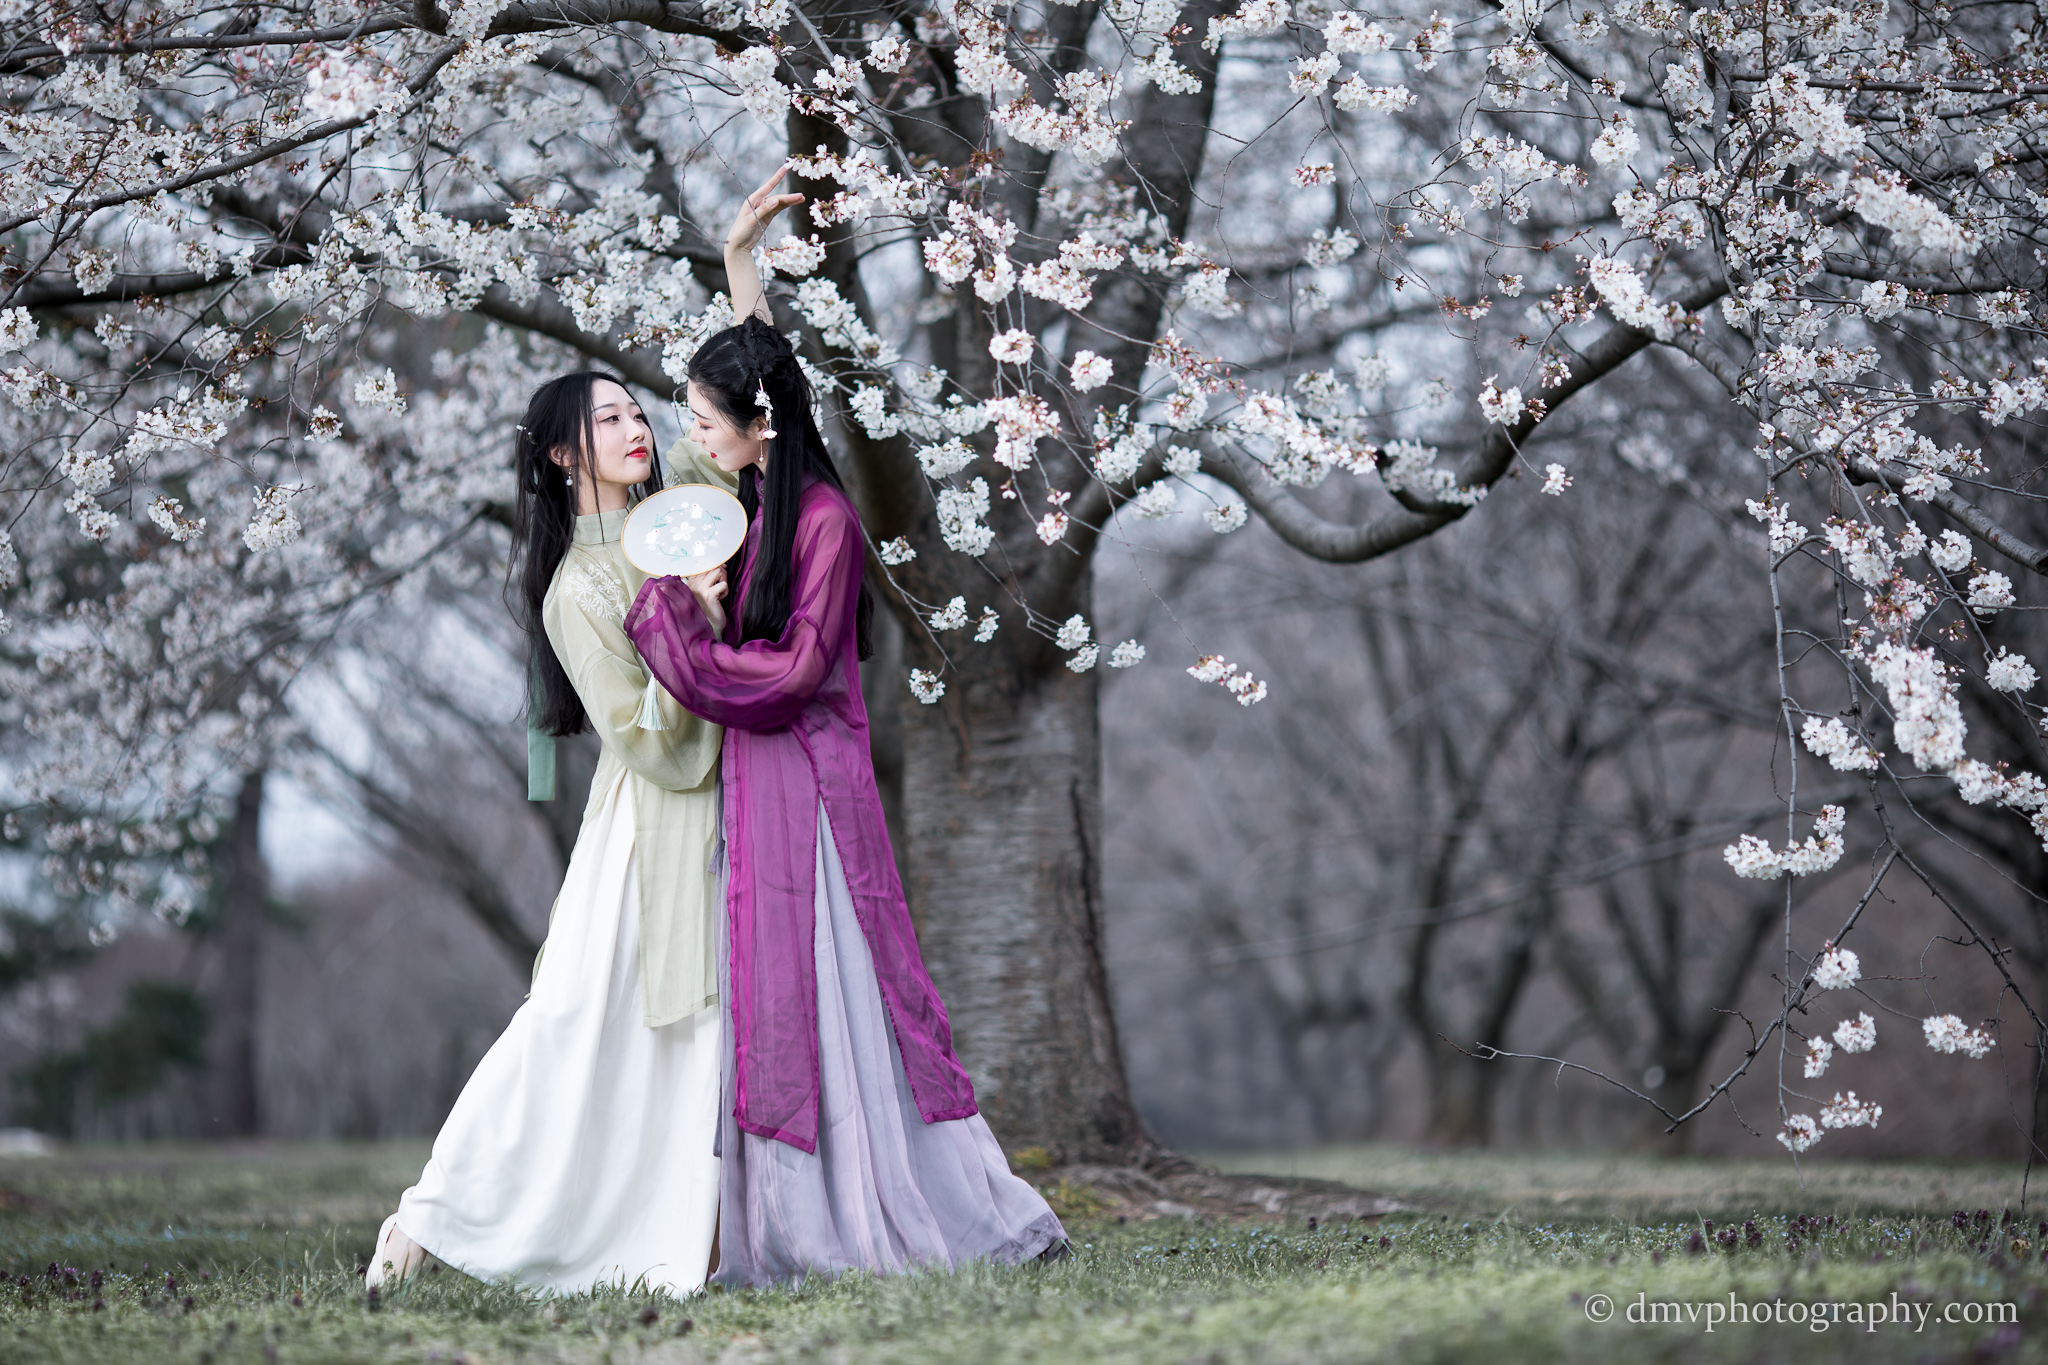 2017-03-25 - Day Cherry Blossom - 00070